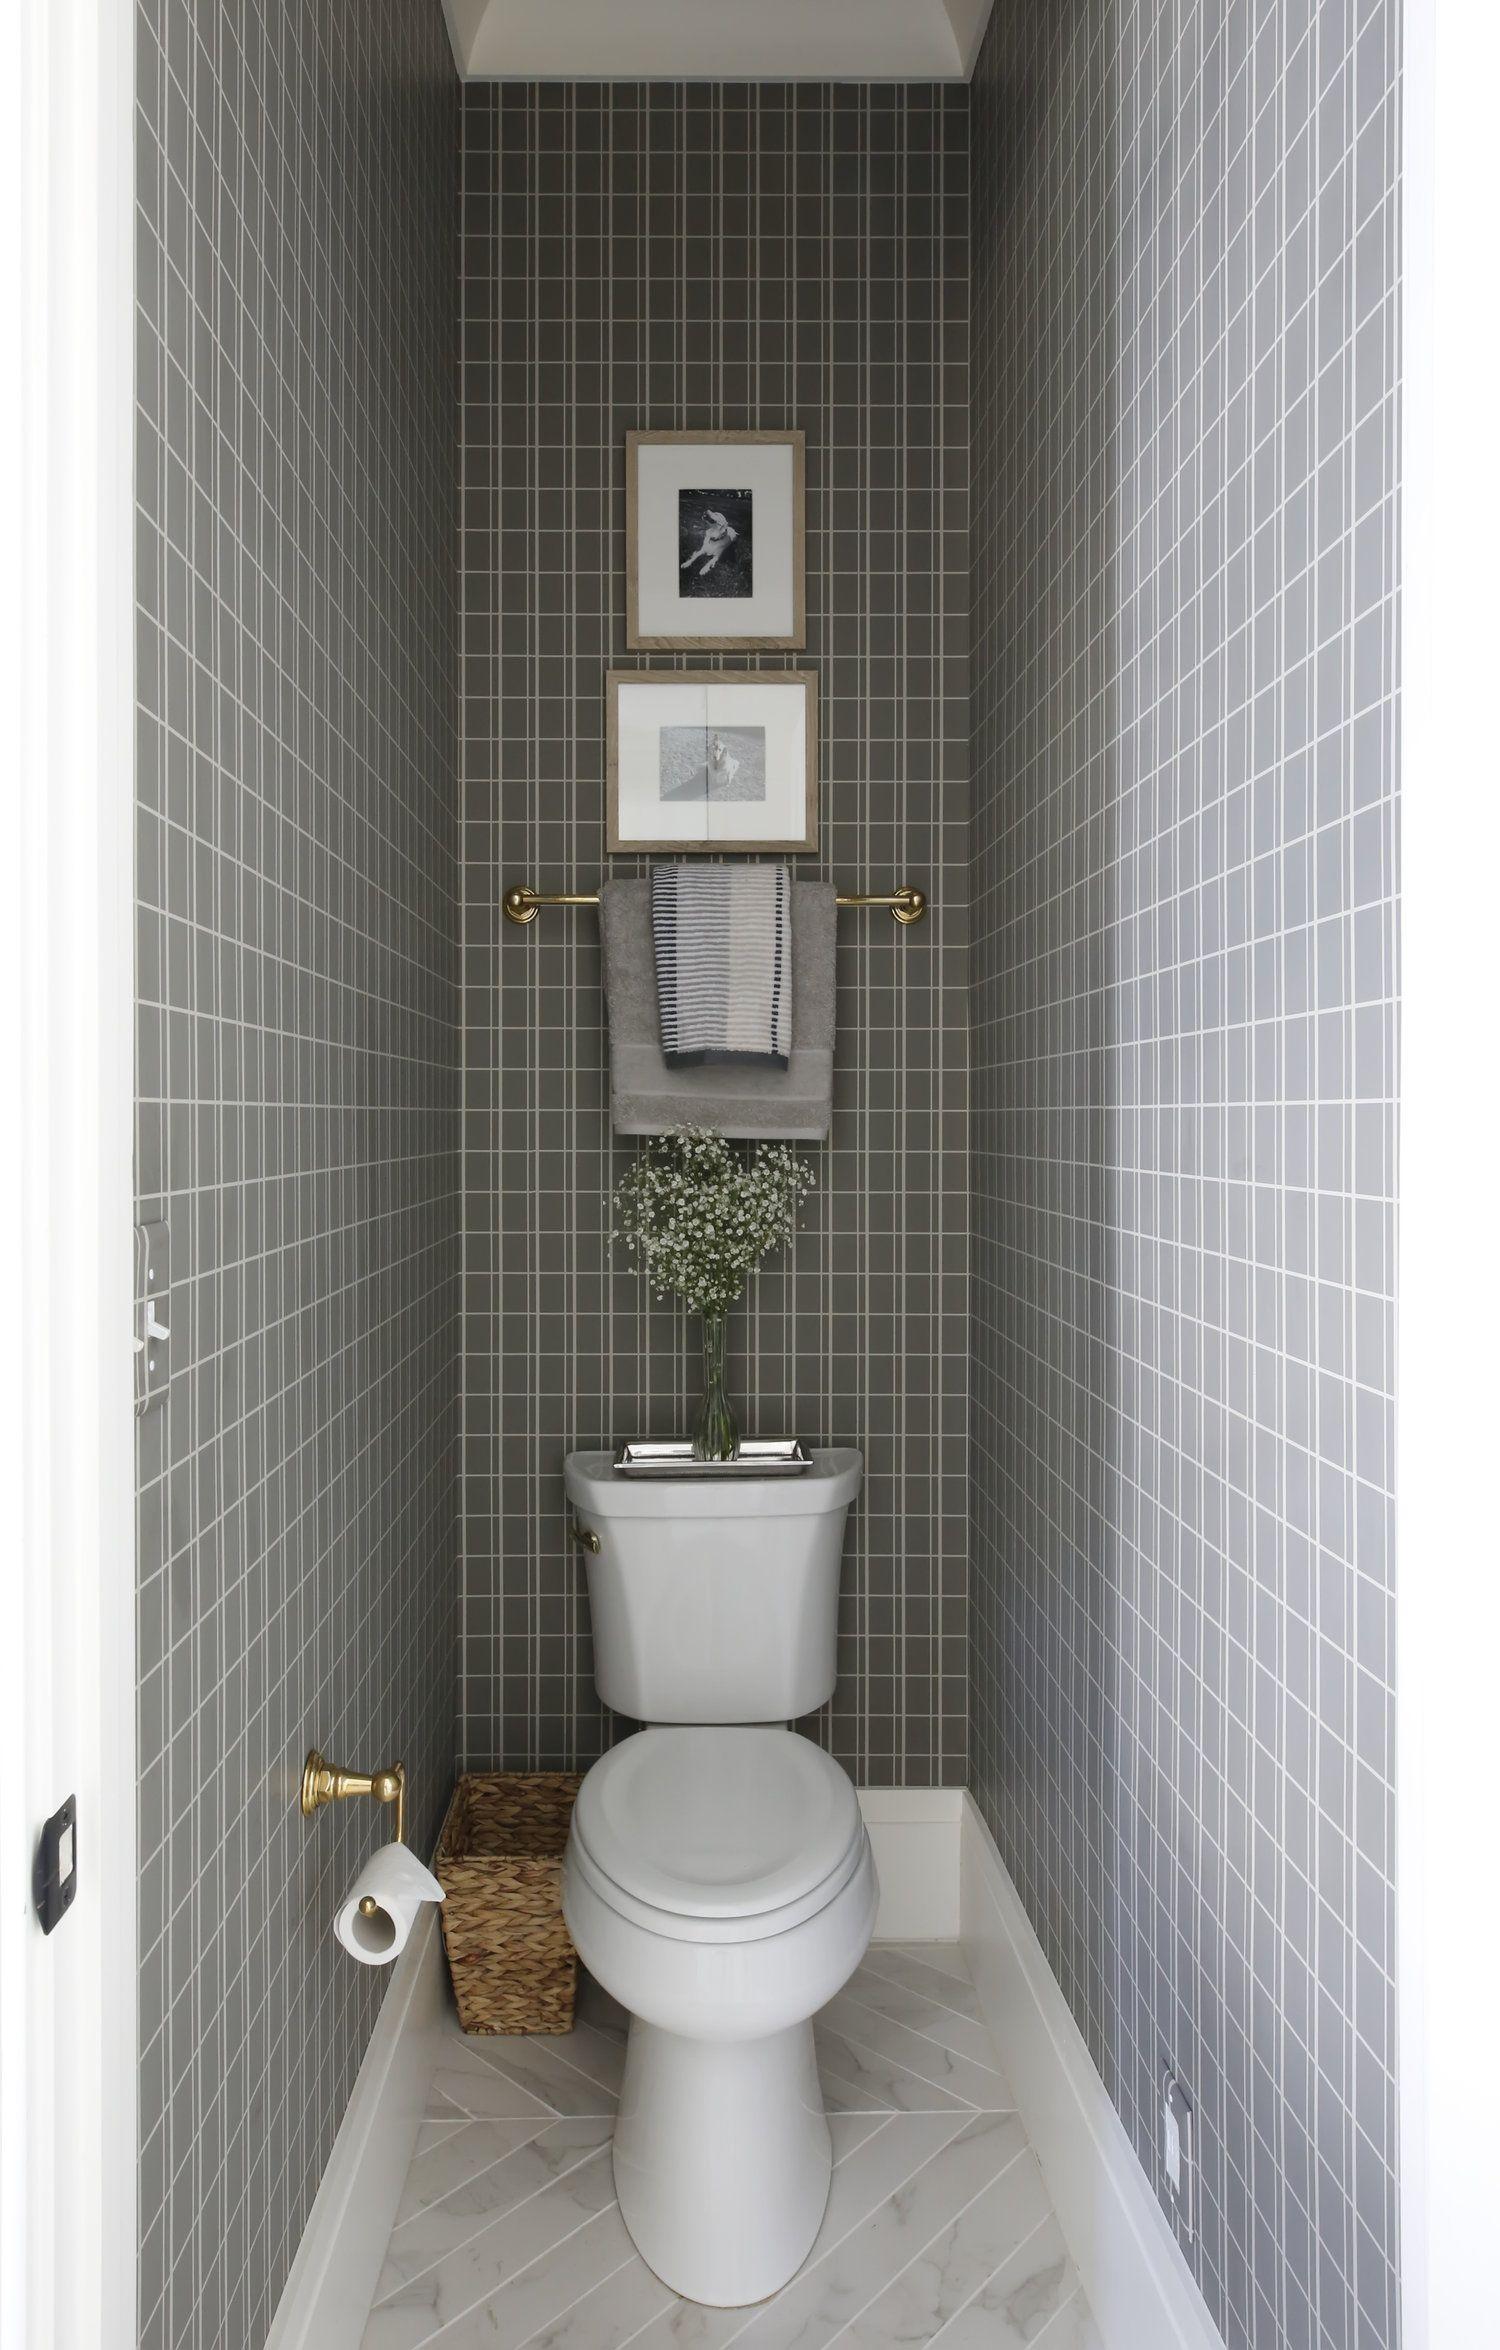 0866 0257b2 Jpg Toilet Room Decor Modern Small Bathrooms Small Bathroom